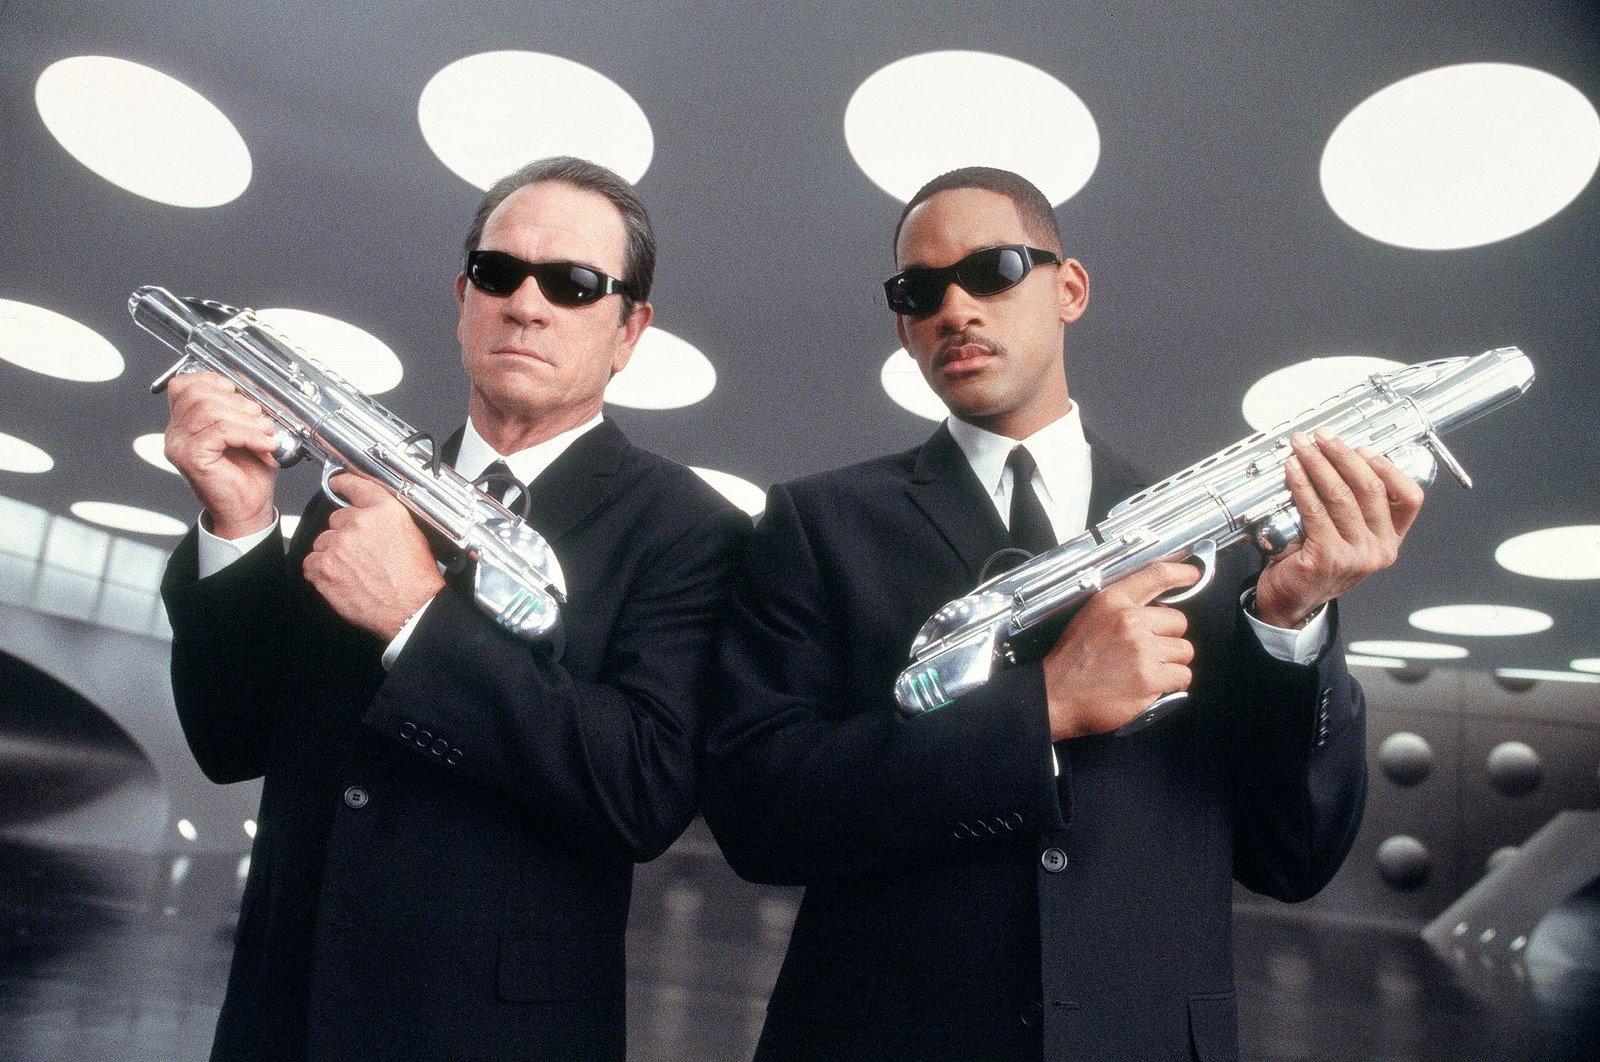 http://2.bp.blogspot.com/_2G68tyoJISk/SddMfyQViCI/AAAAAAAAAA8/7uMJ9zv8gX4/s1600/Men+In+Black+3+Movie.jpg